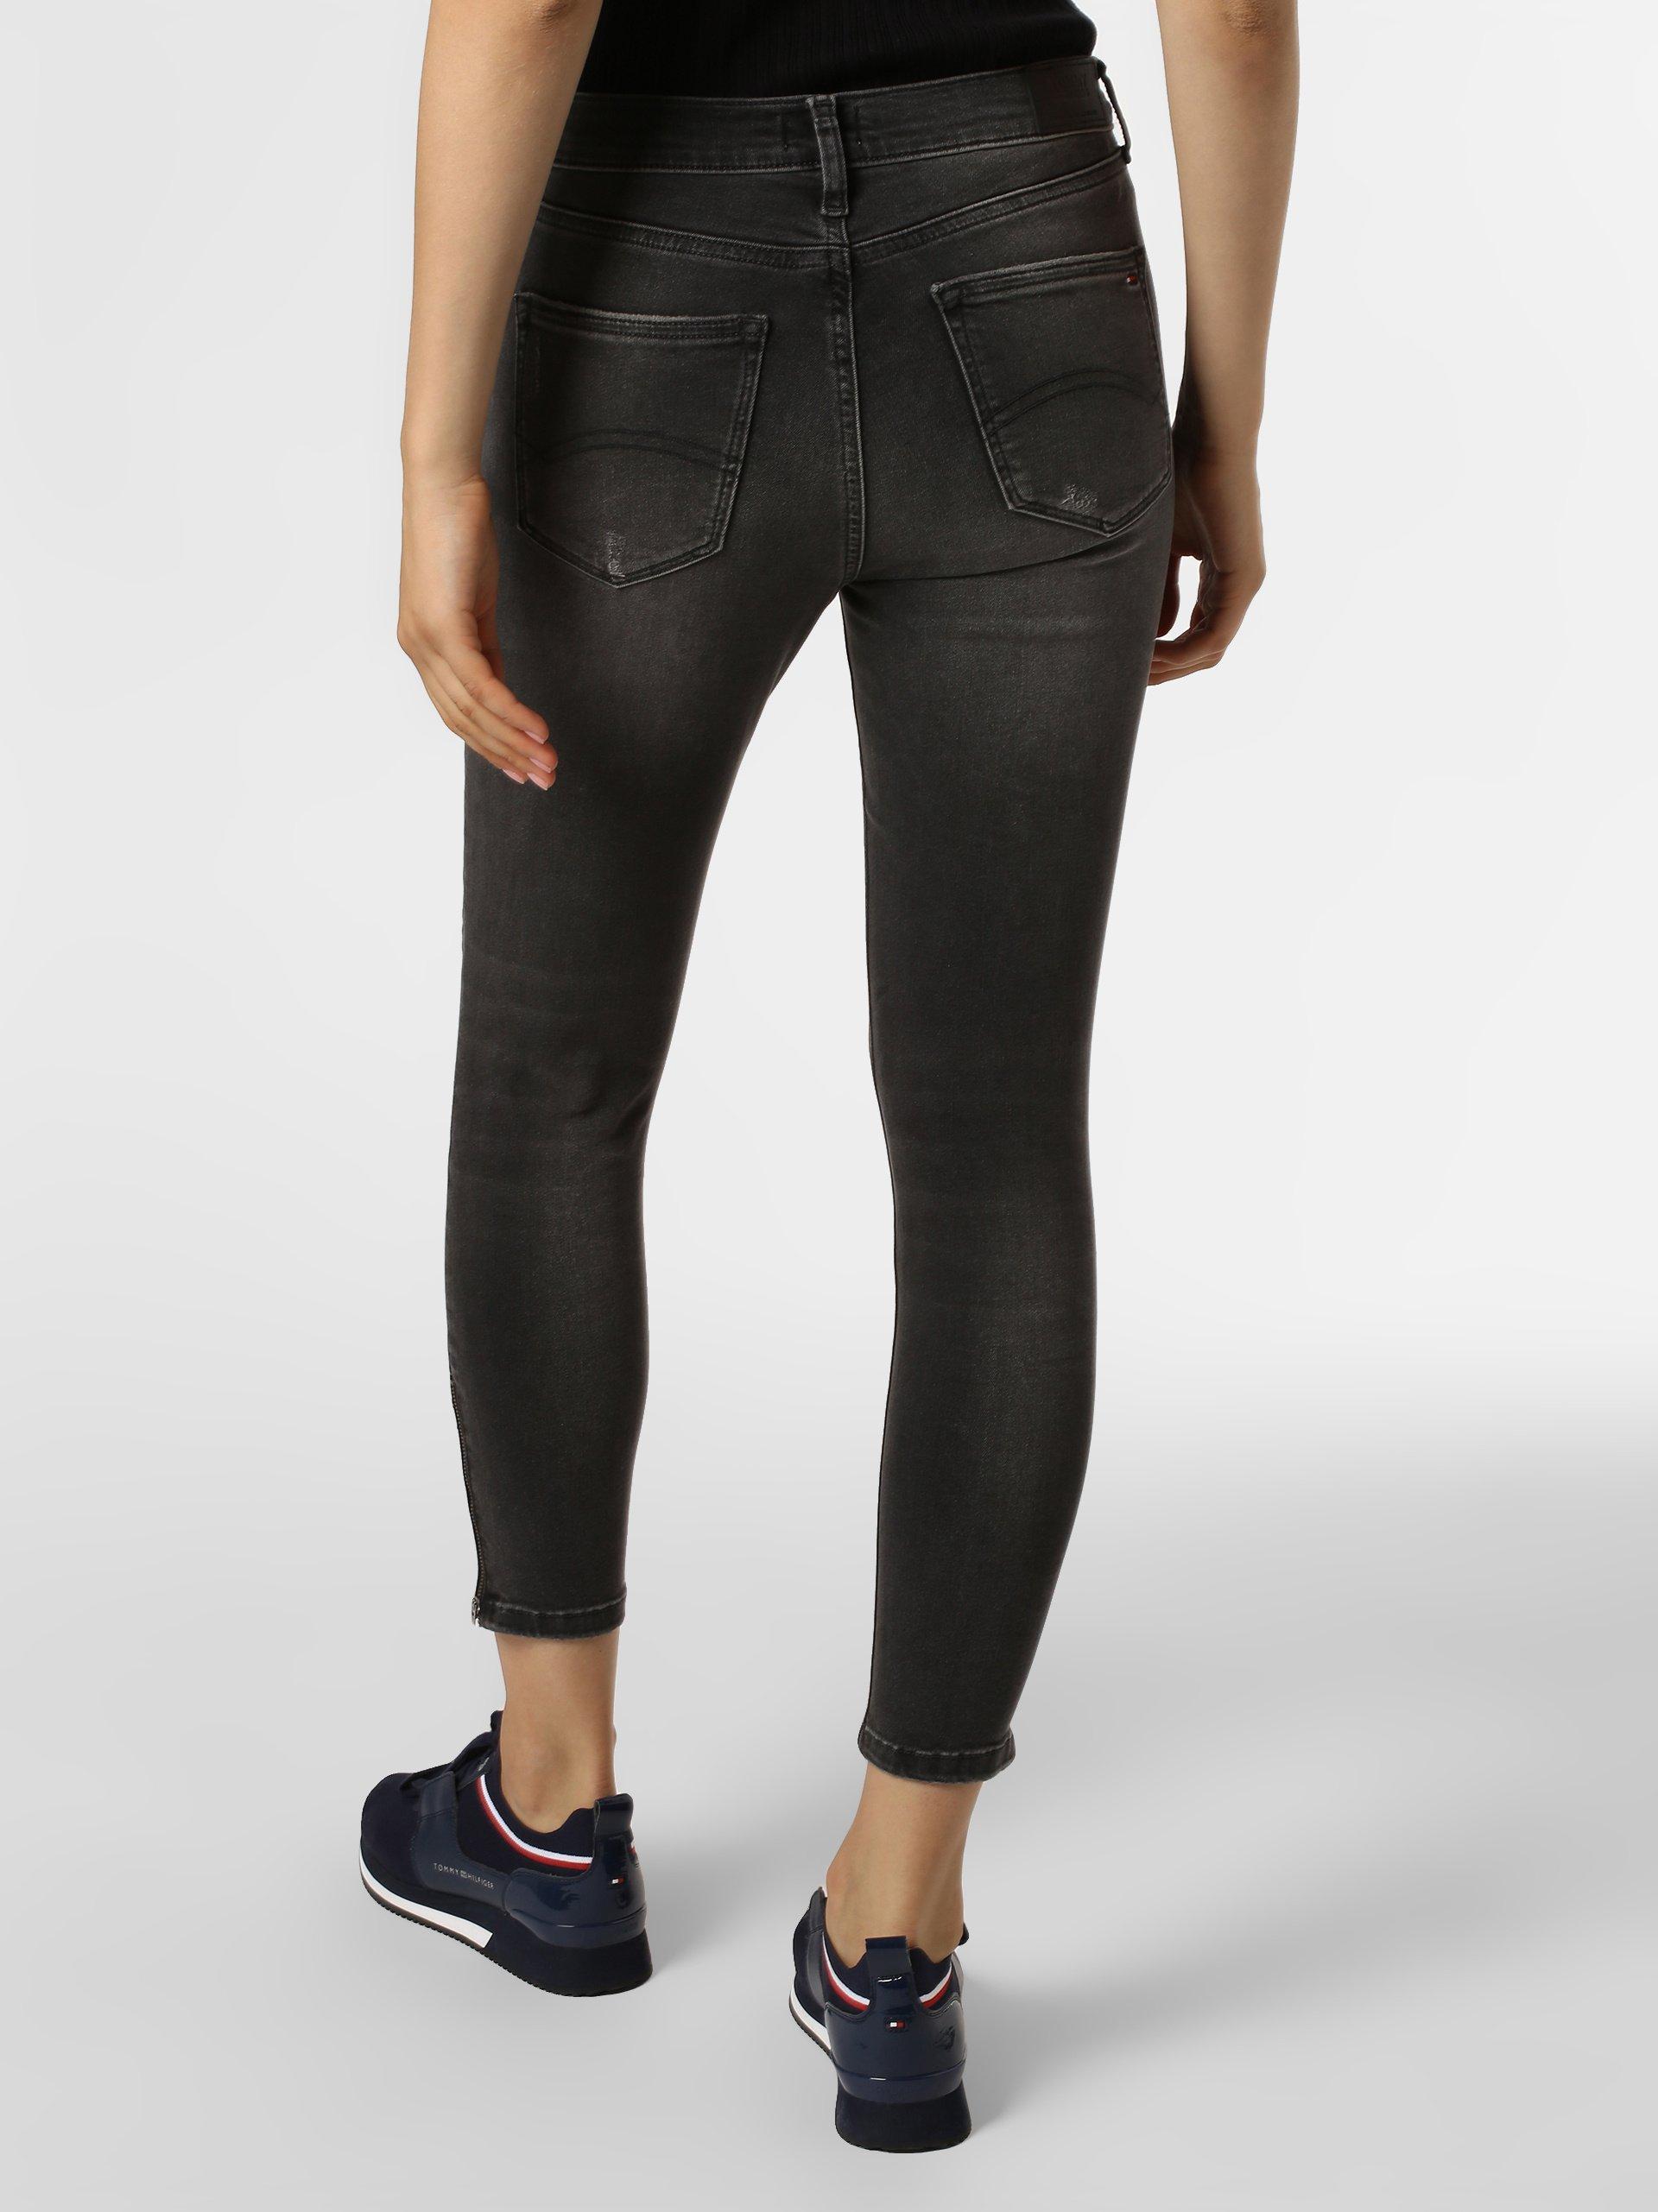 Tommy Jeans Damen Jeans - Nora